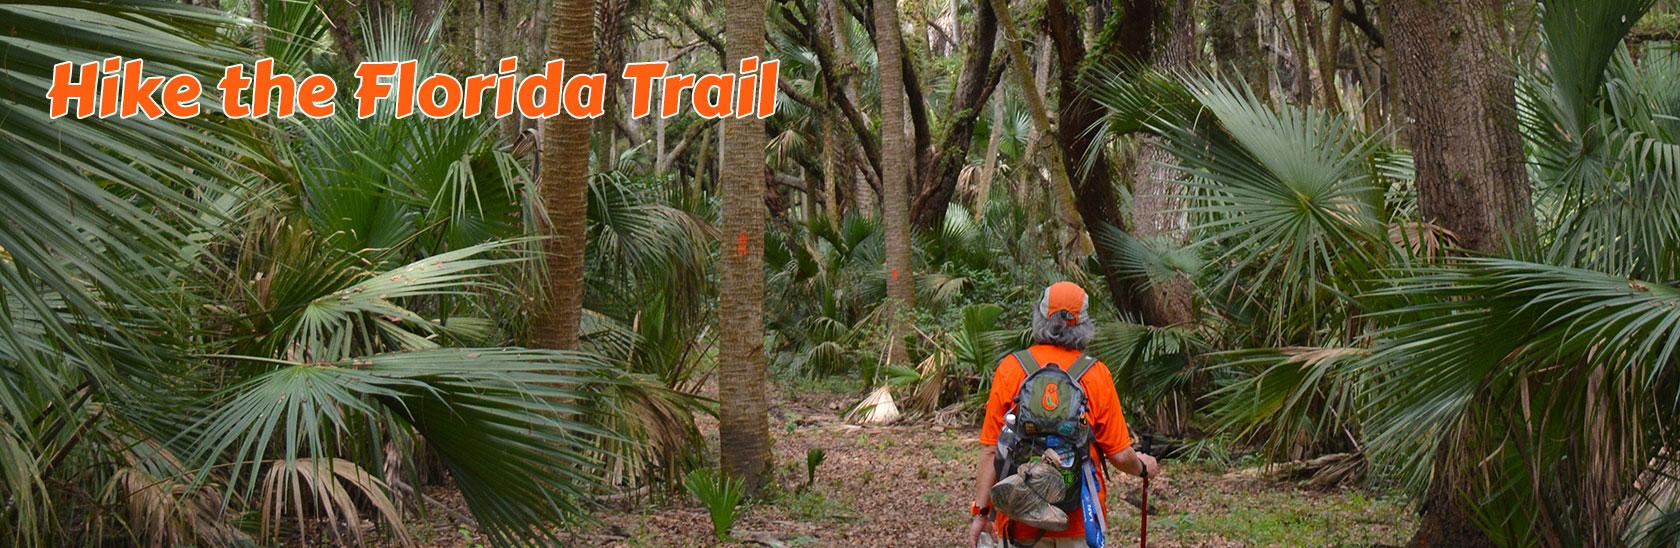 Hike the Florida Trail